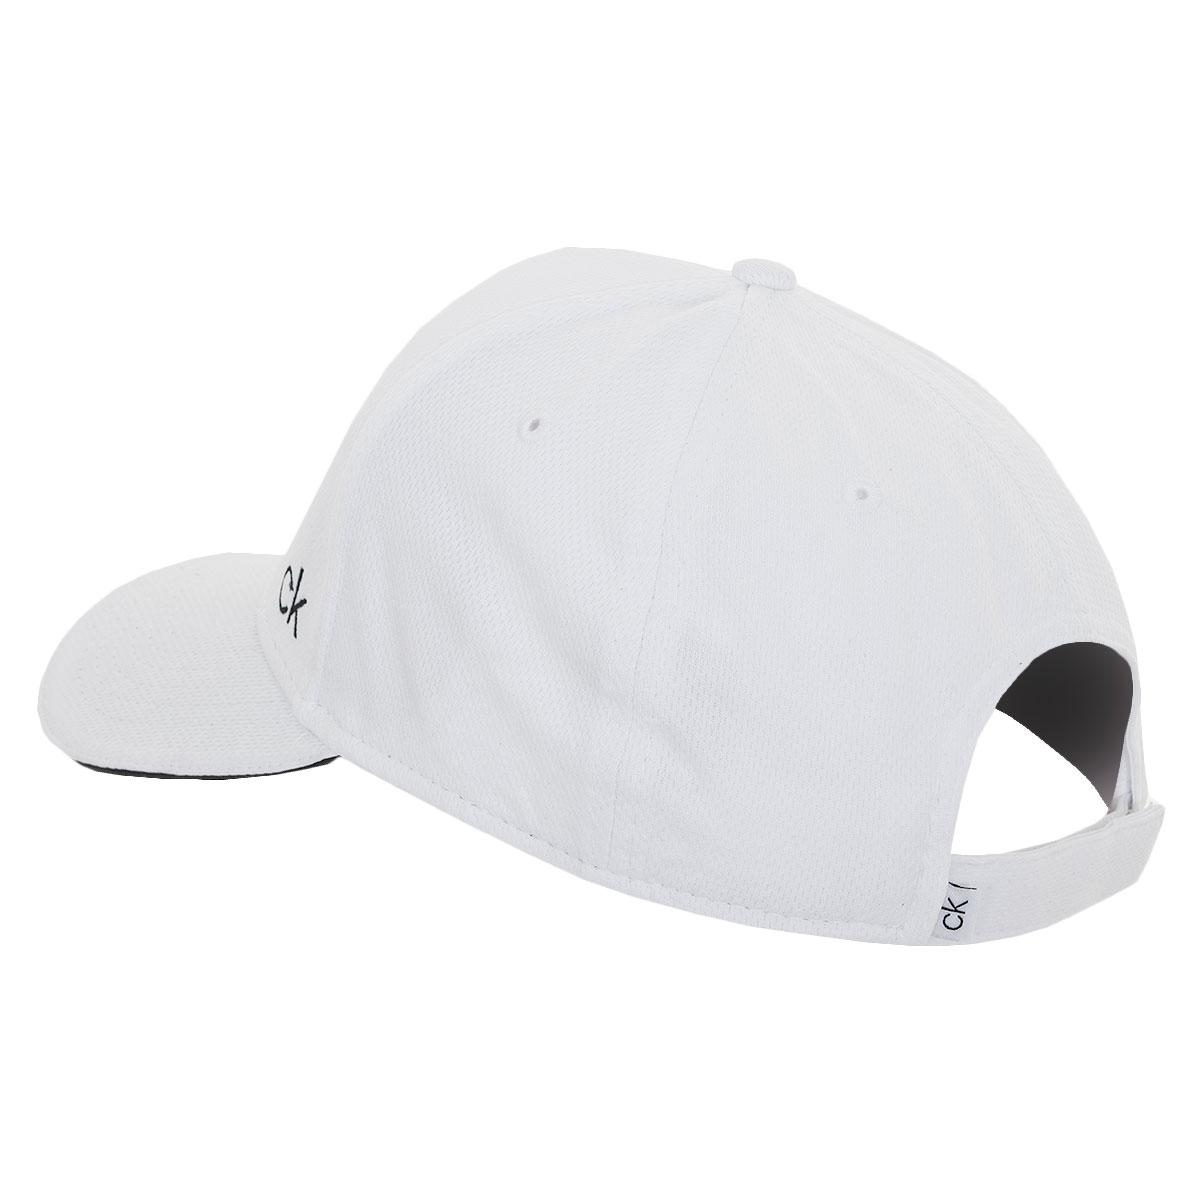 Calvin-Klein-Golf-2019-Airtex-Performance-Adjustable-Quick-Dry-Cap-40-OFF-RRP thumbnail 21